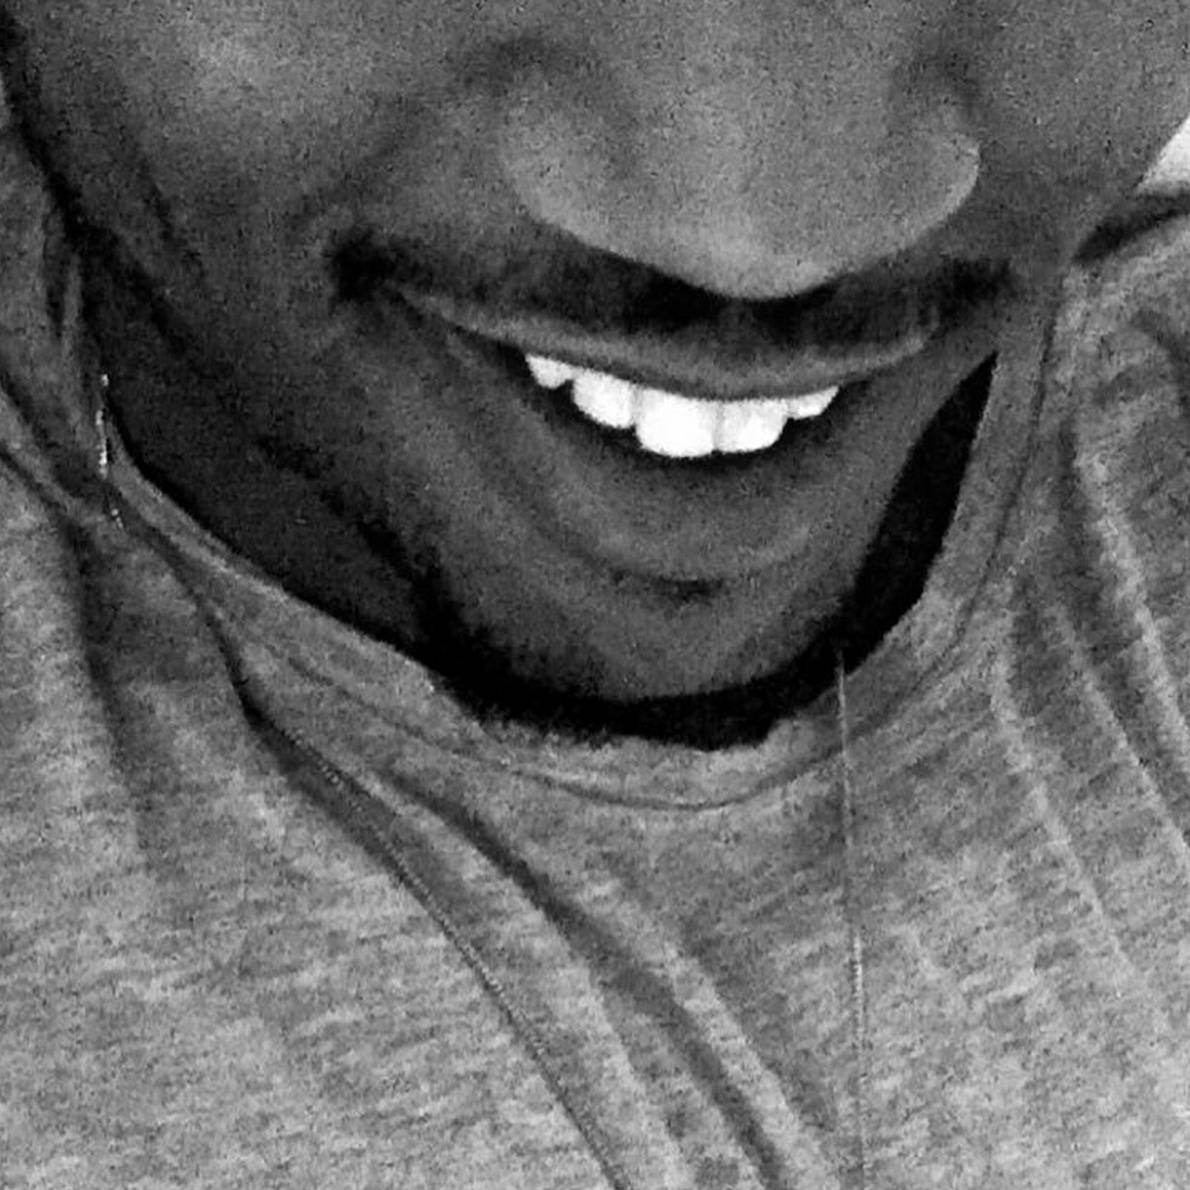 Mr. Steal Yo Girl With His Smile - Those pretty teeth.(Photo: Trey Songz via Instagram)